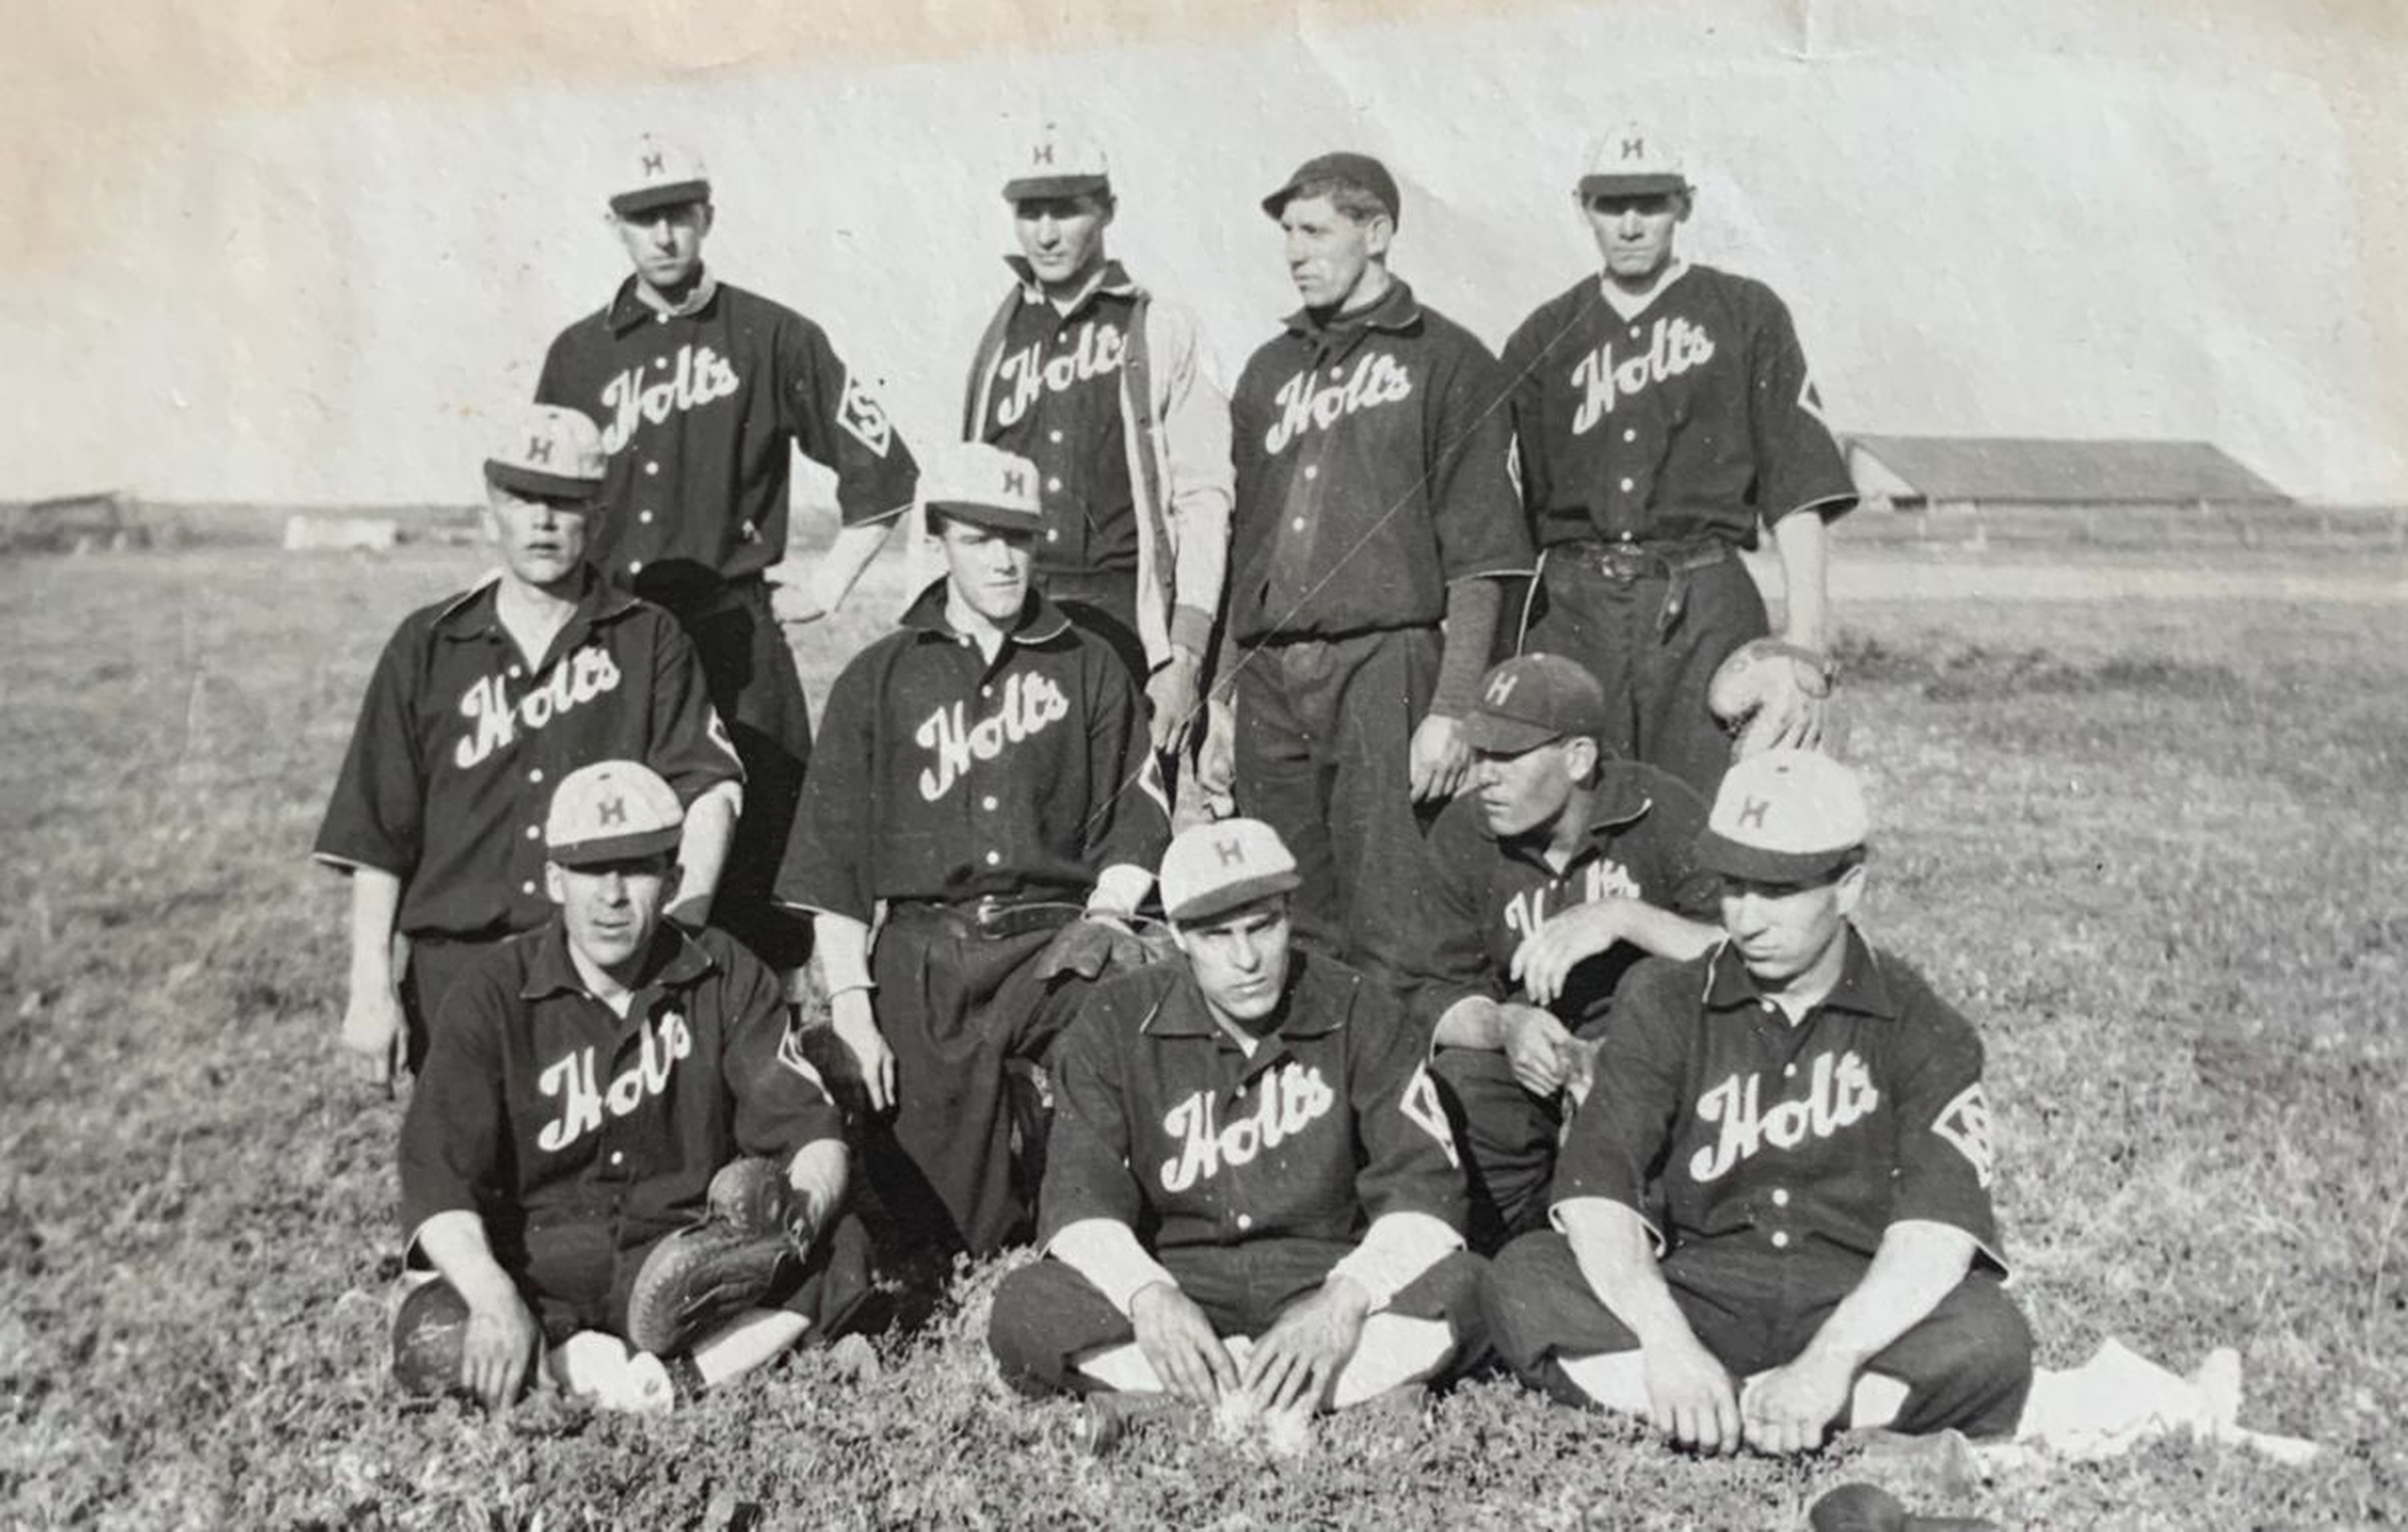 The1910 Holt Side Hills company-sponsored baseball team.